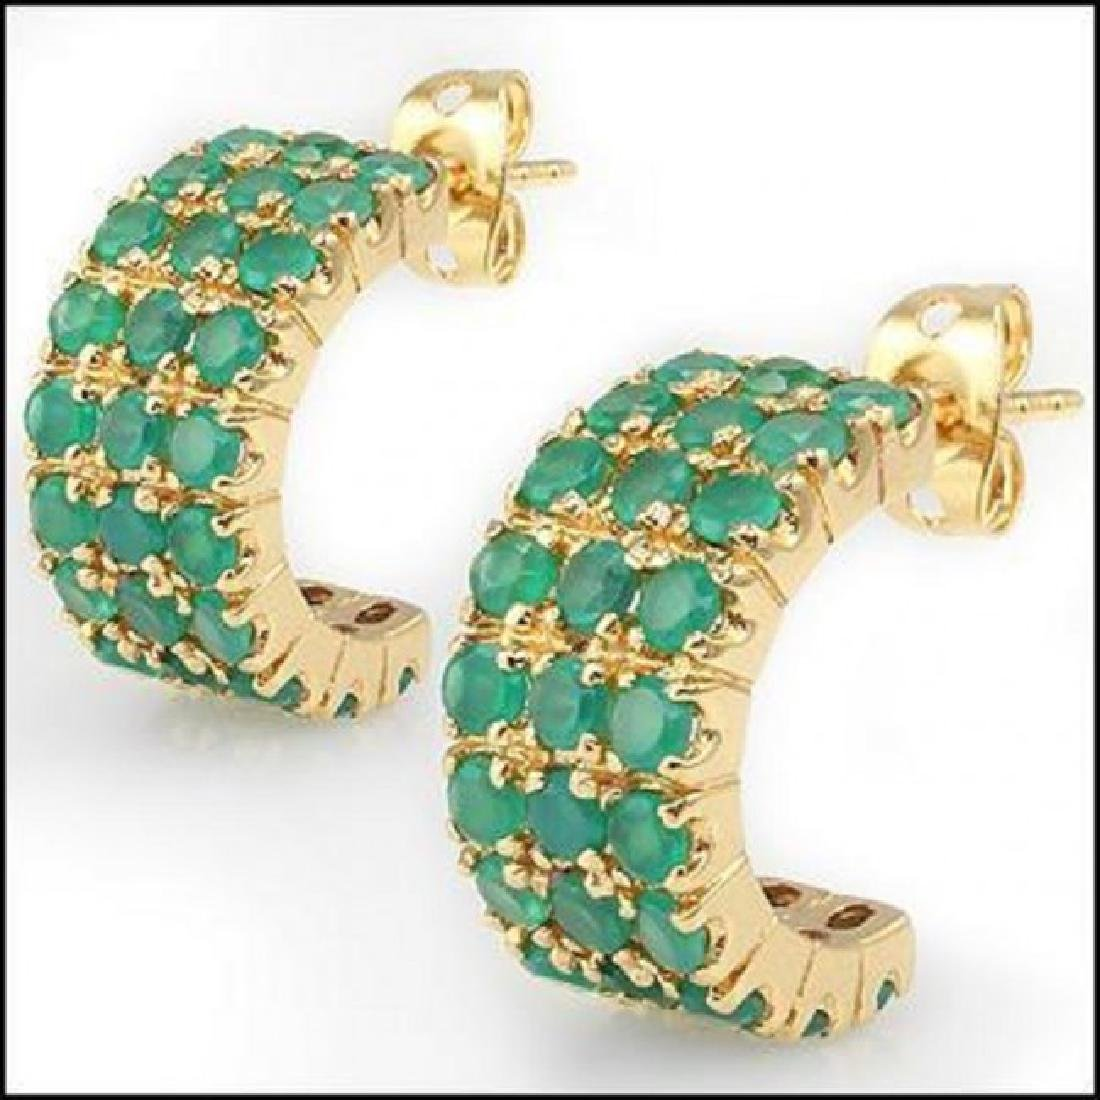 Jewelry Sale 6.02 CT Green Agate Stud Designer Earrings - 2